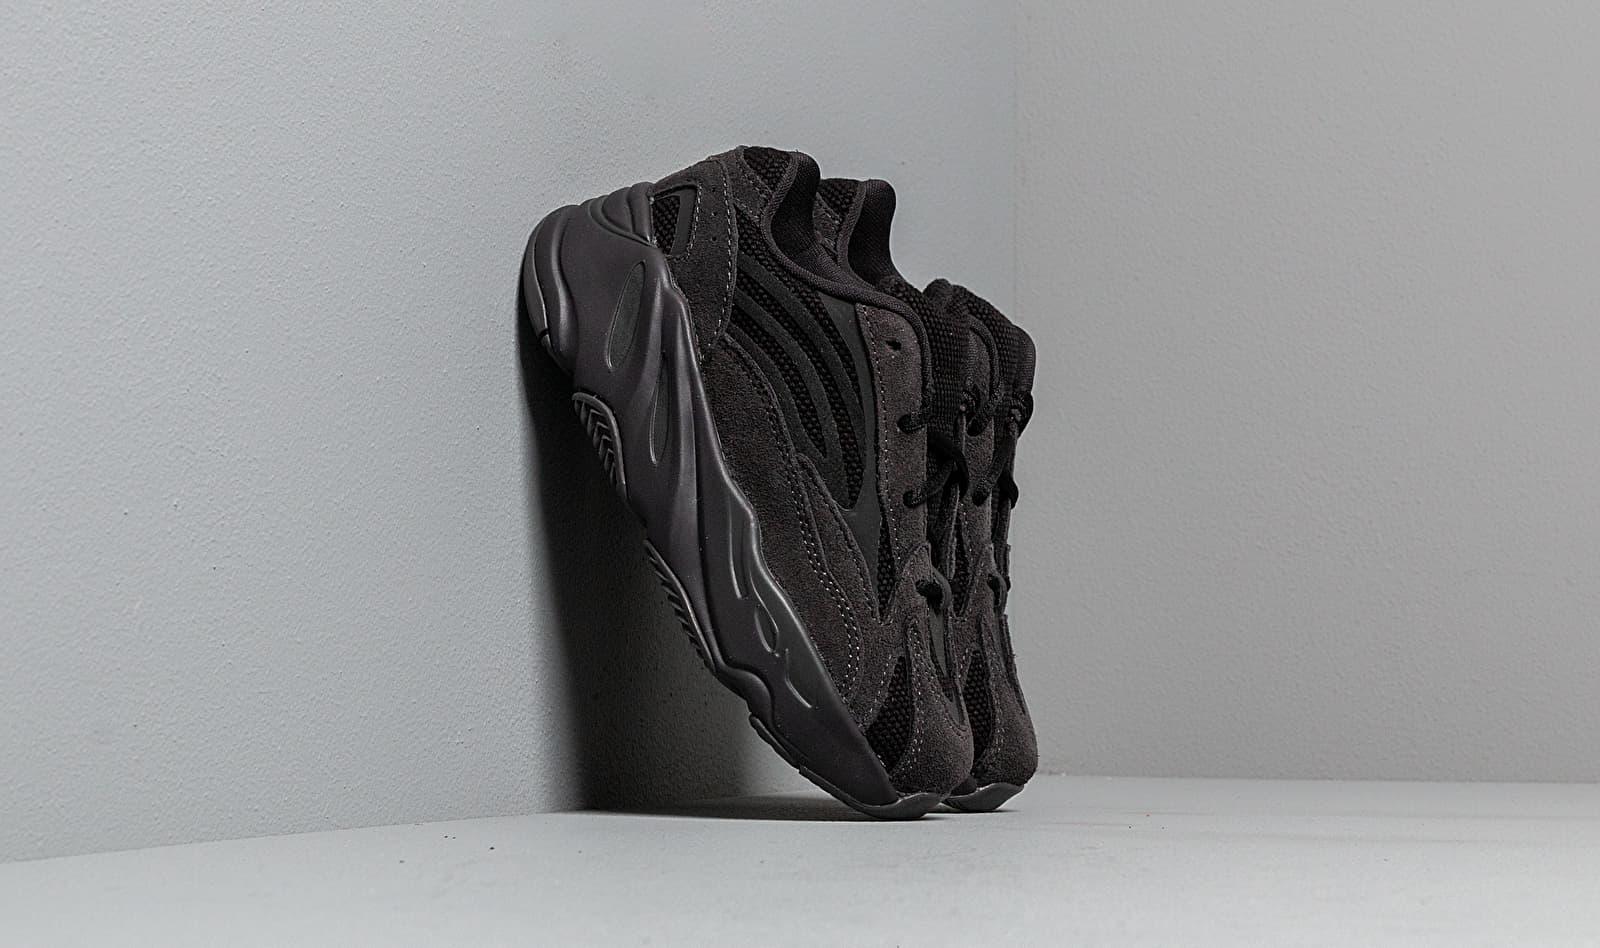 adidas Yeezy Boost 700 V2 Infant Vanta/ Vanta/ Vanta, Black